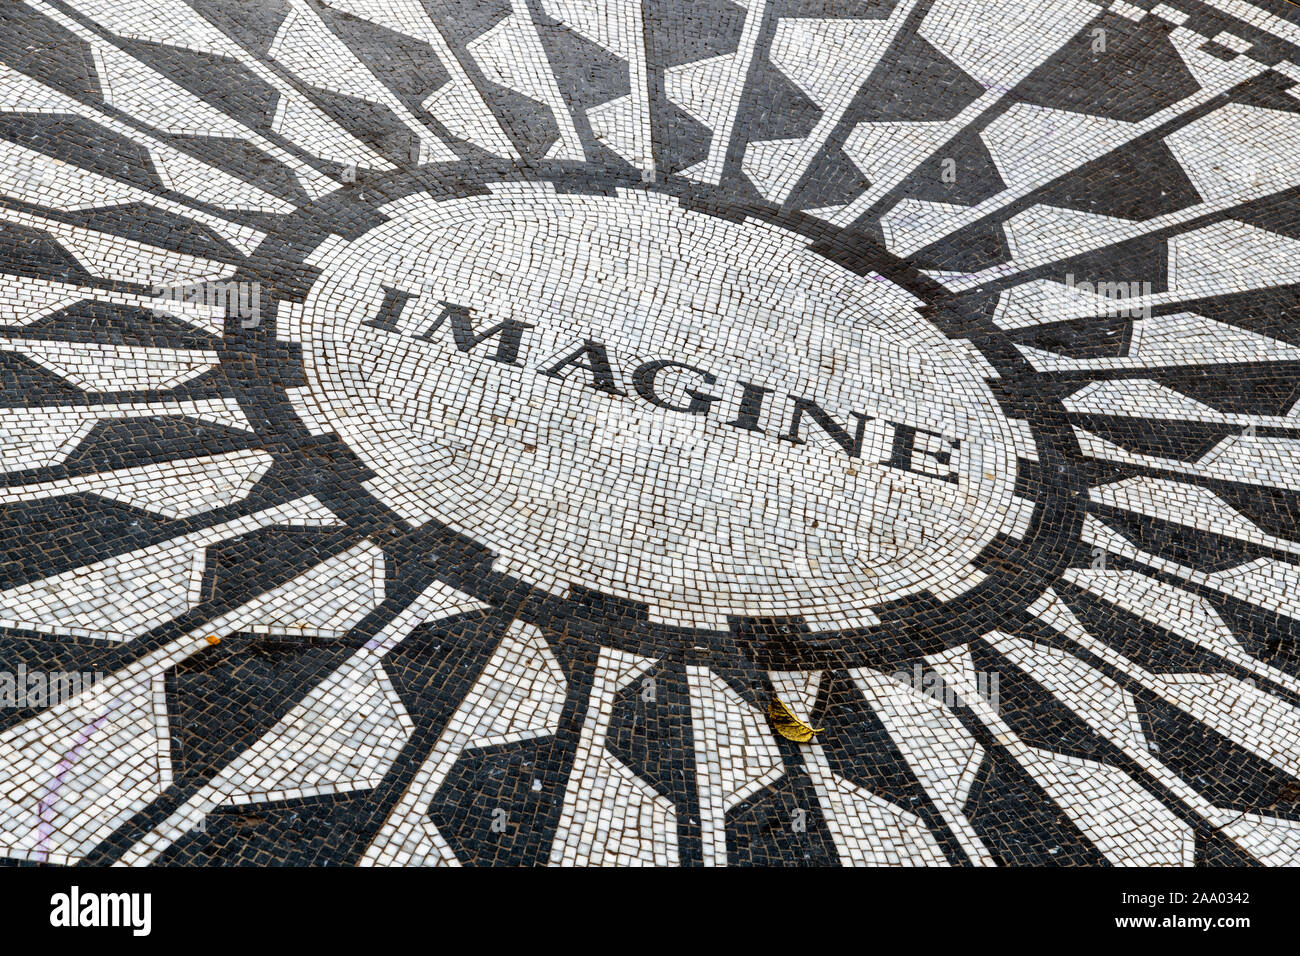 Imagine circular pathway mosaic, Strawberry Fields memorial, Central Park, Manhattan, New York, USA Stock Photo